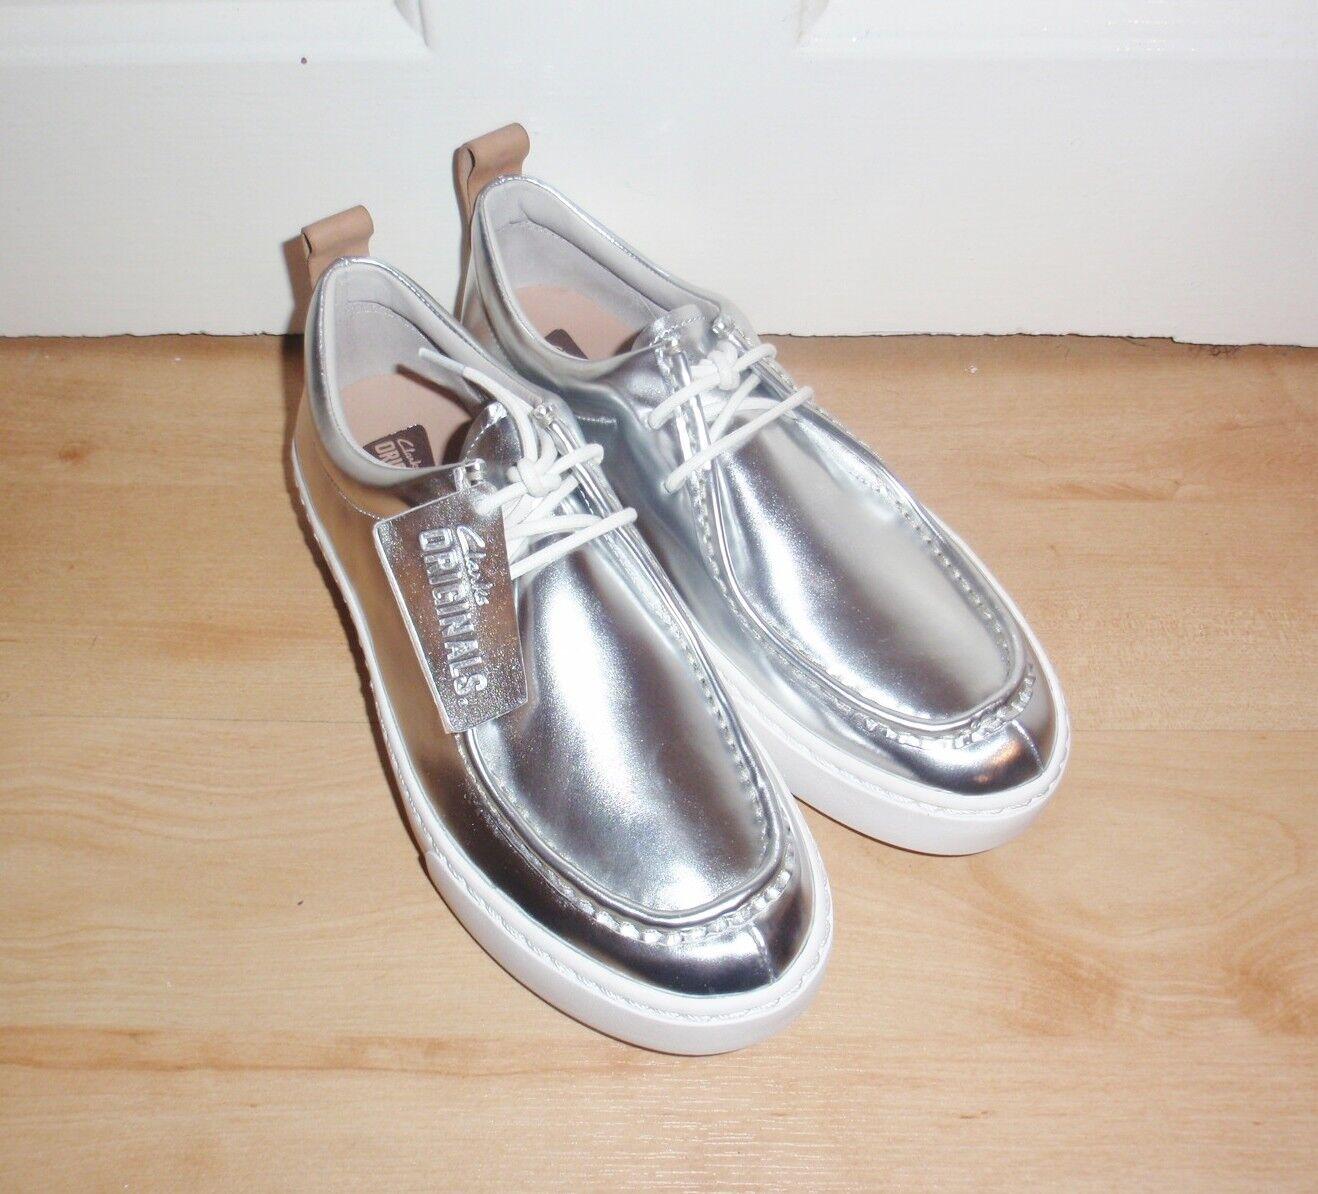 BNIB Clarks Originals Damenss PRIDDY WALLA silver Leder casual schuhe